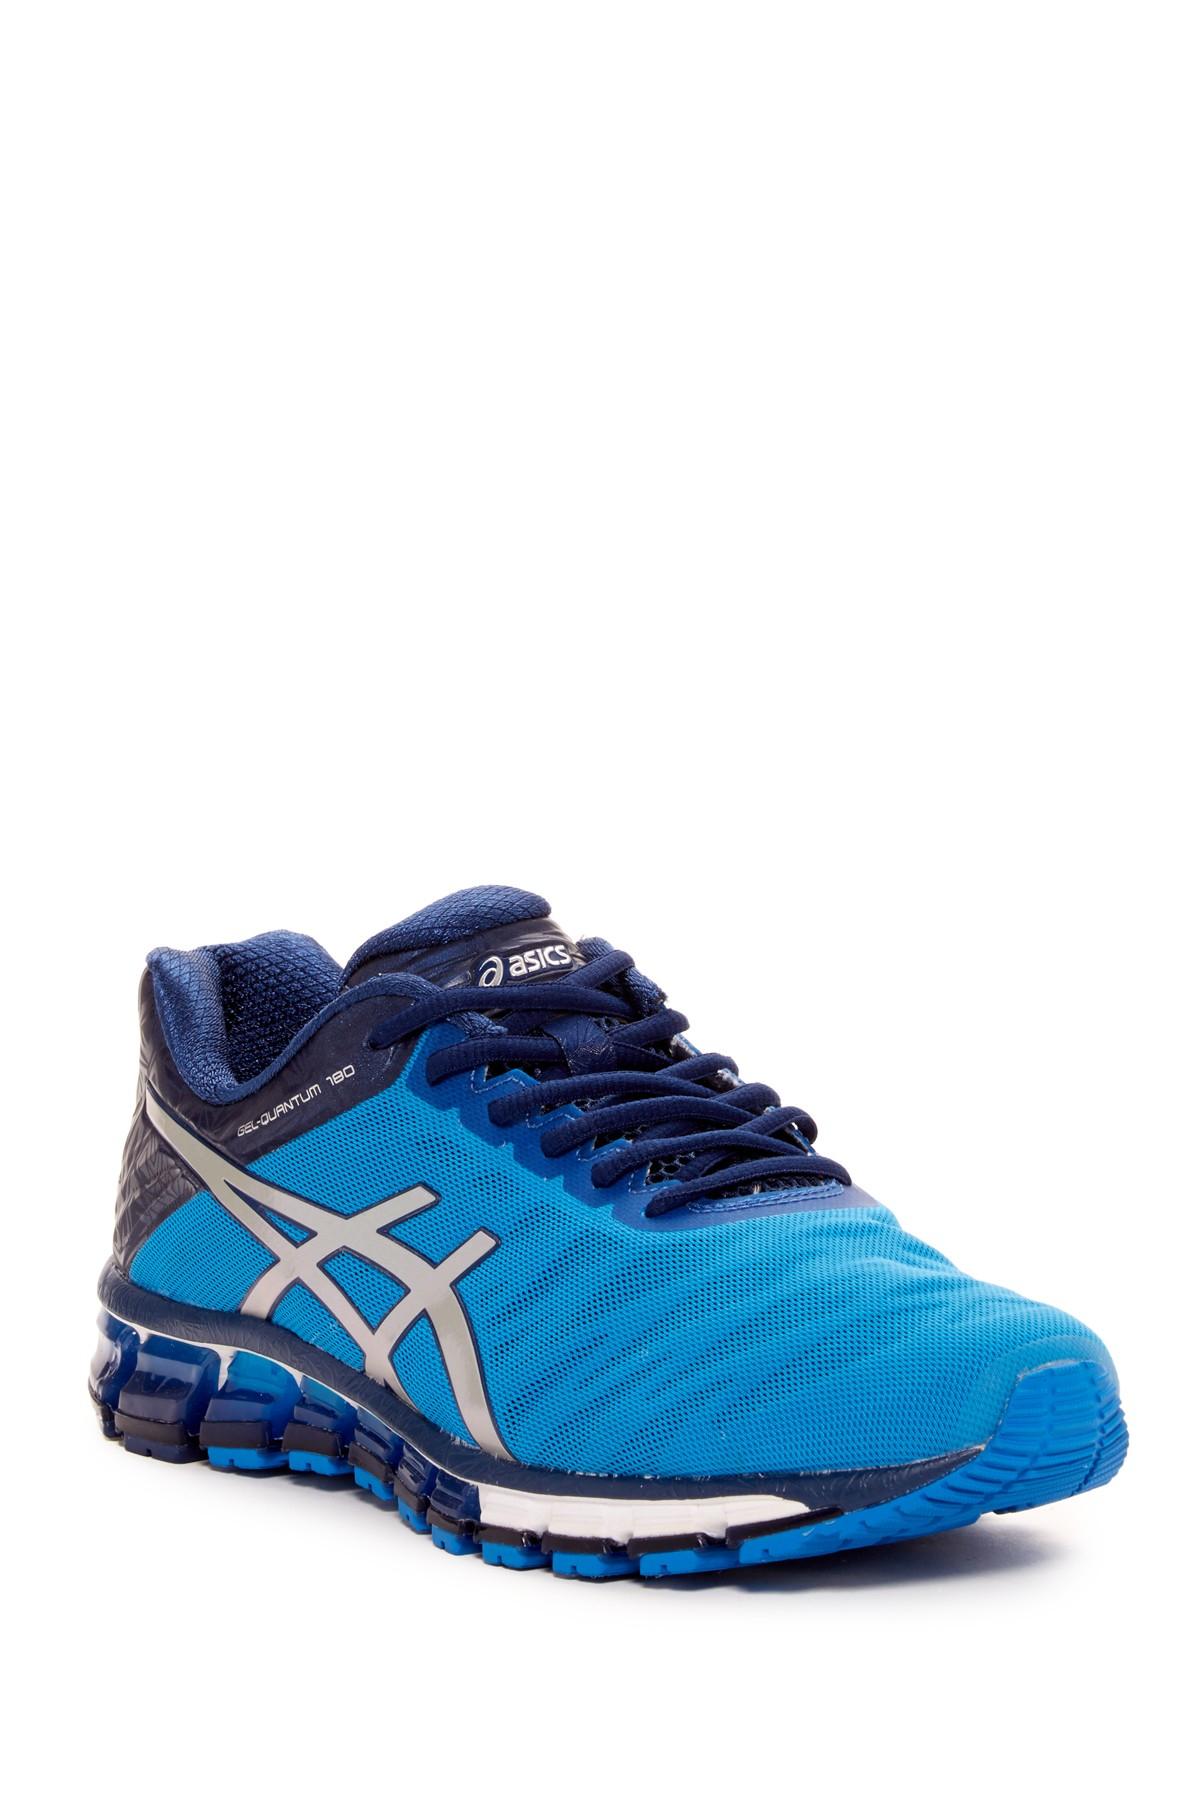 Asics Quantum  Blue Running Shoes